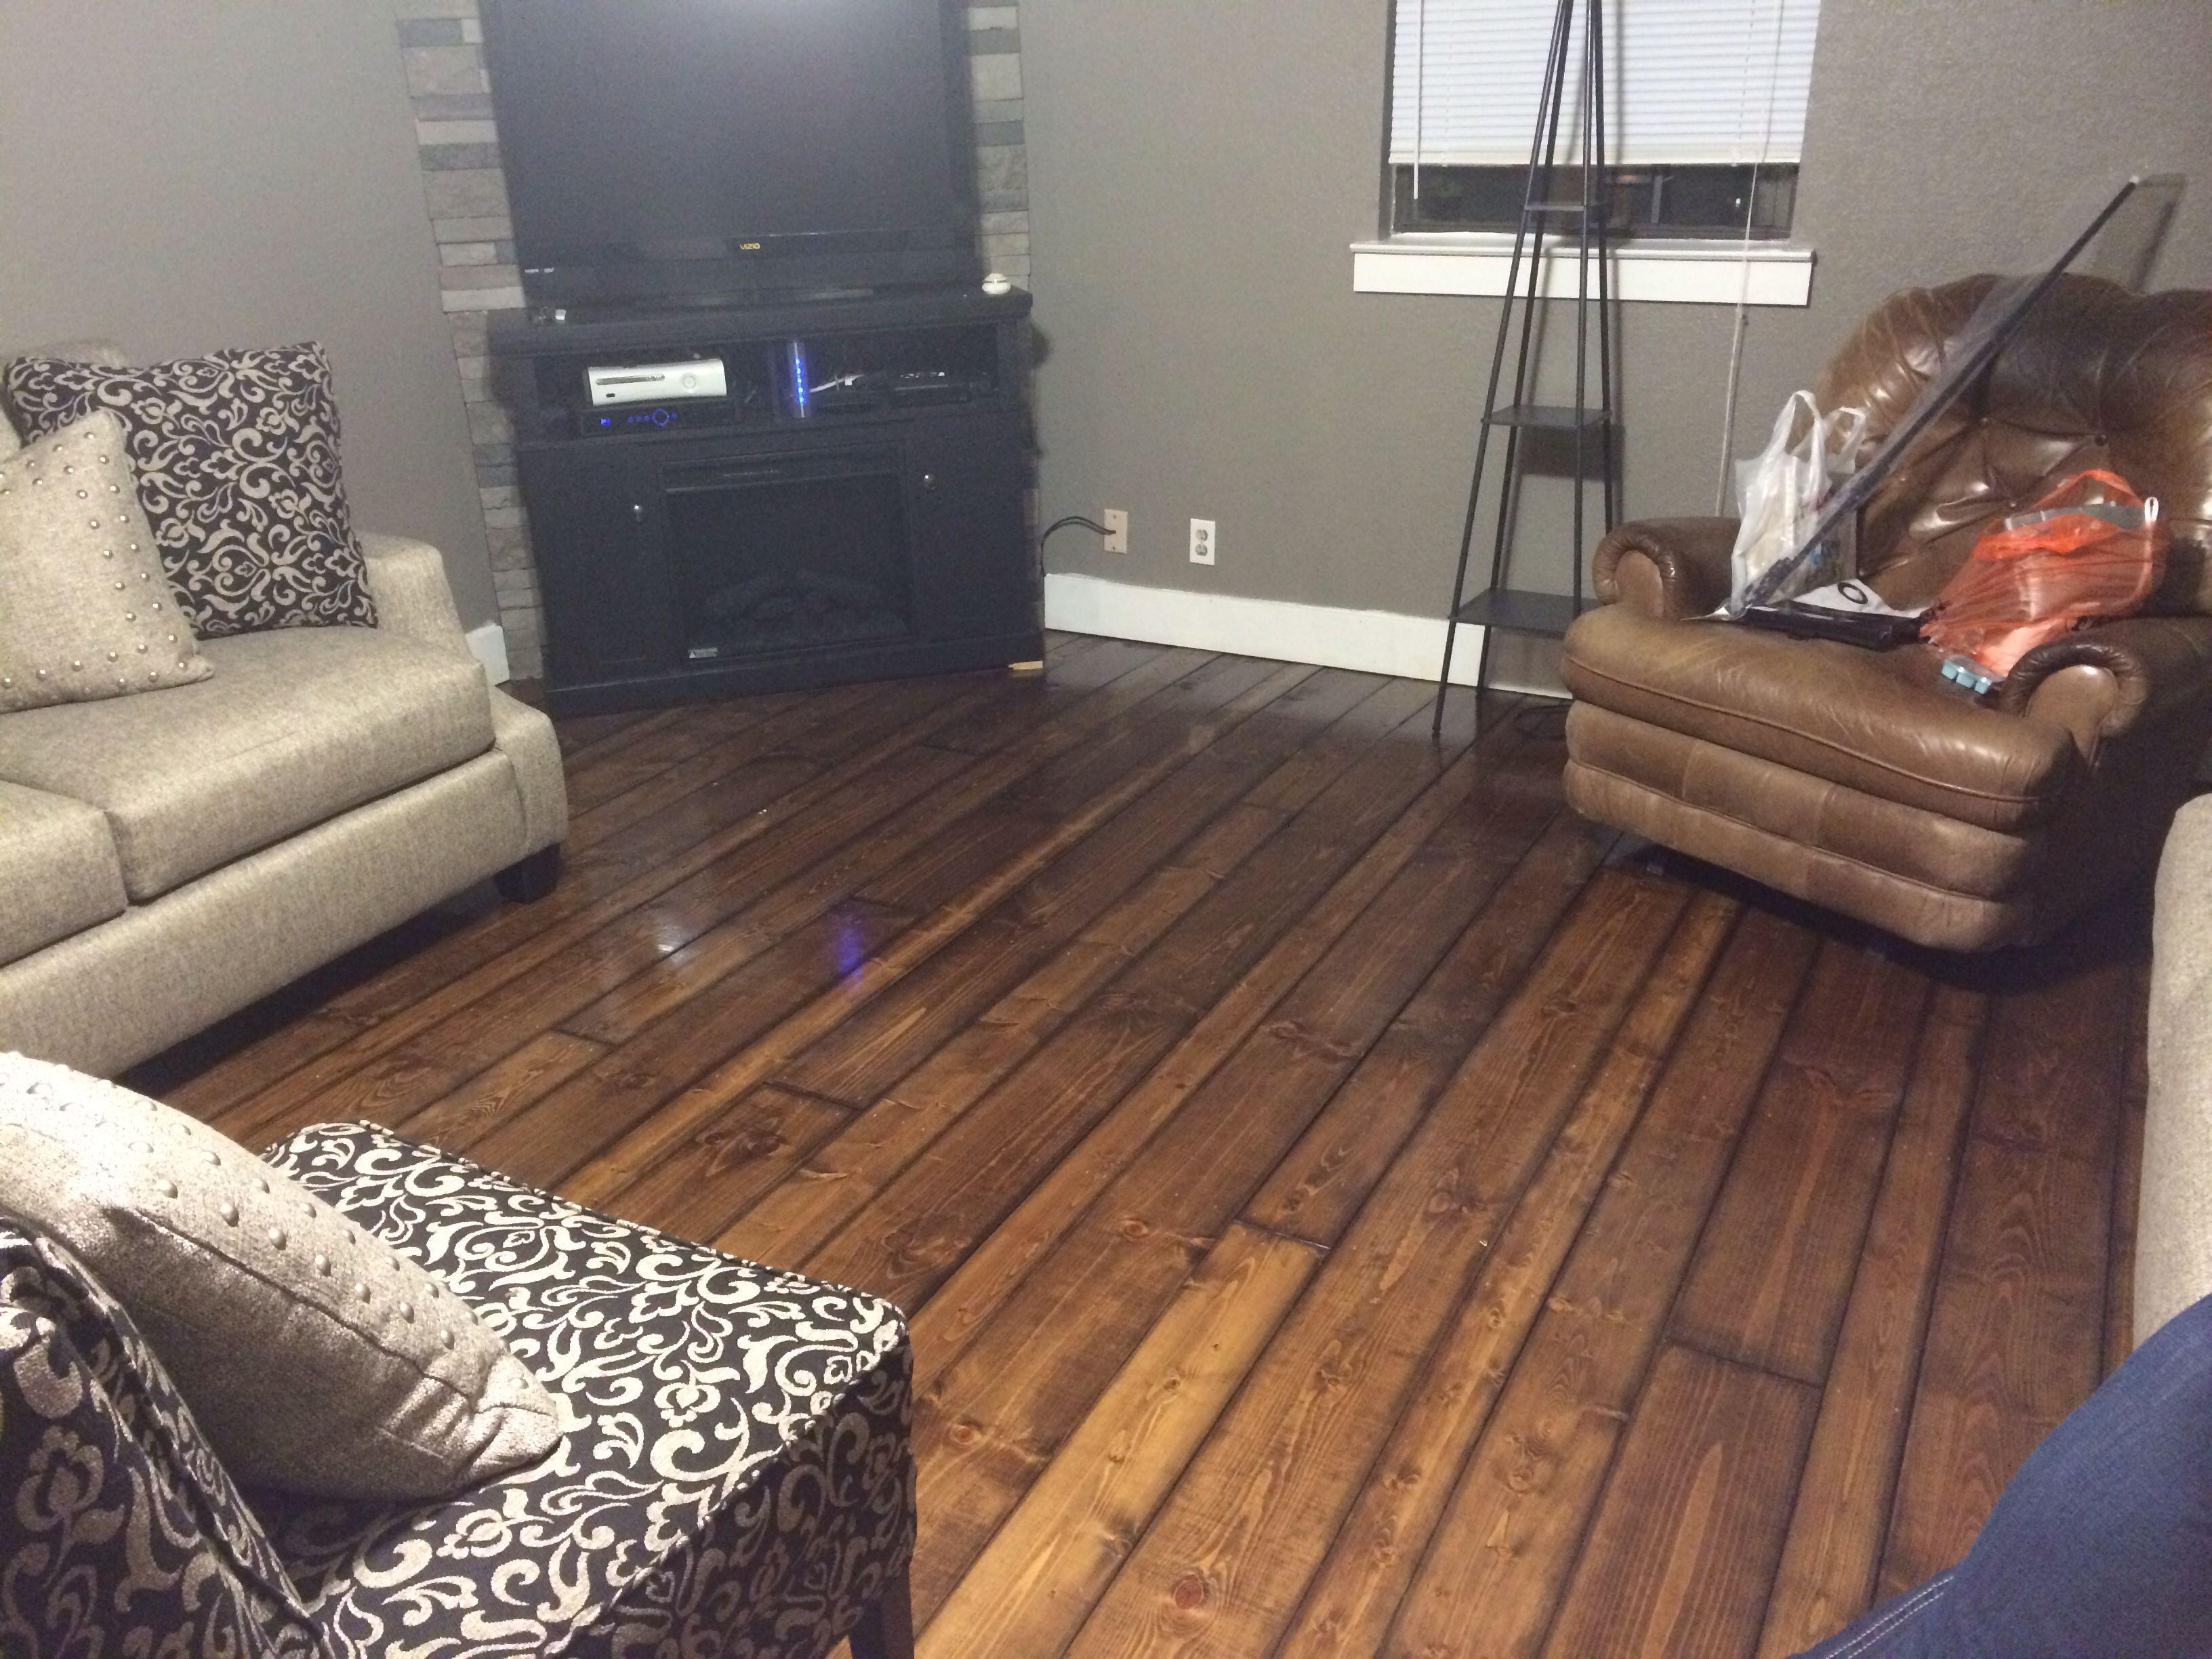 Cost Effective Flooring my new hardwood floors. diy: sand & stain 2x4, 2x6, & 2x8 yellow